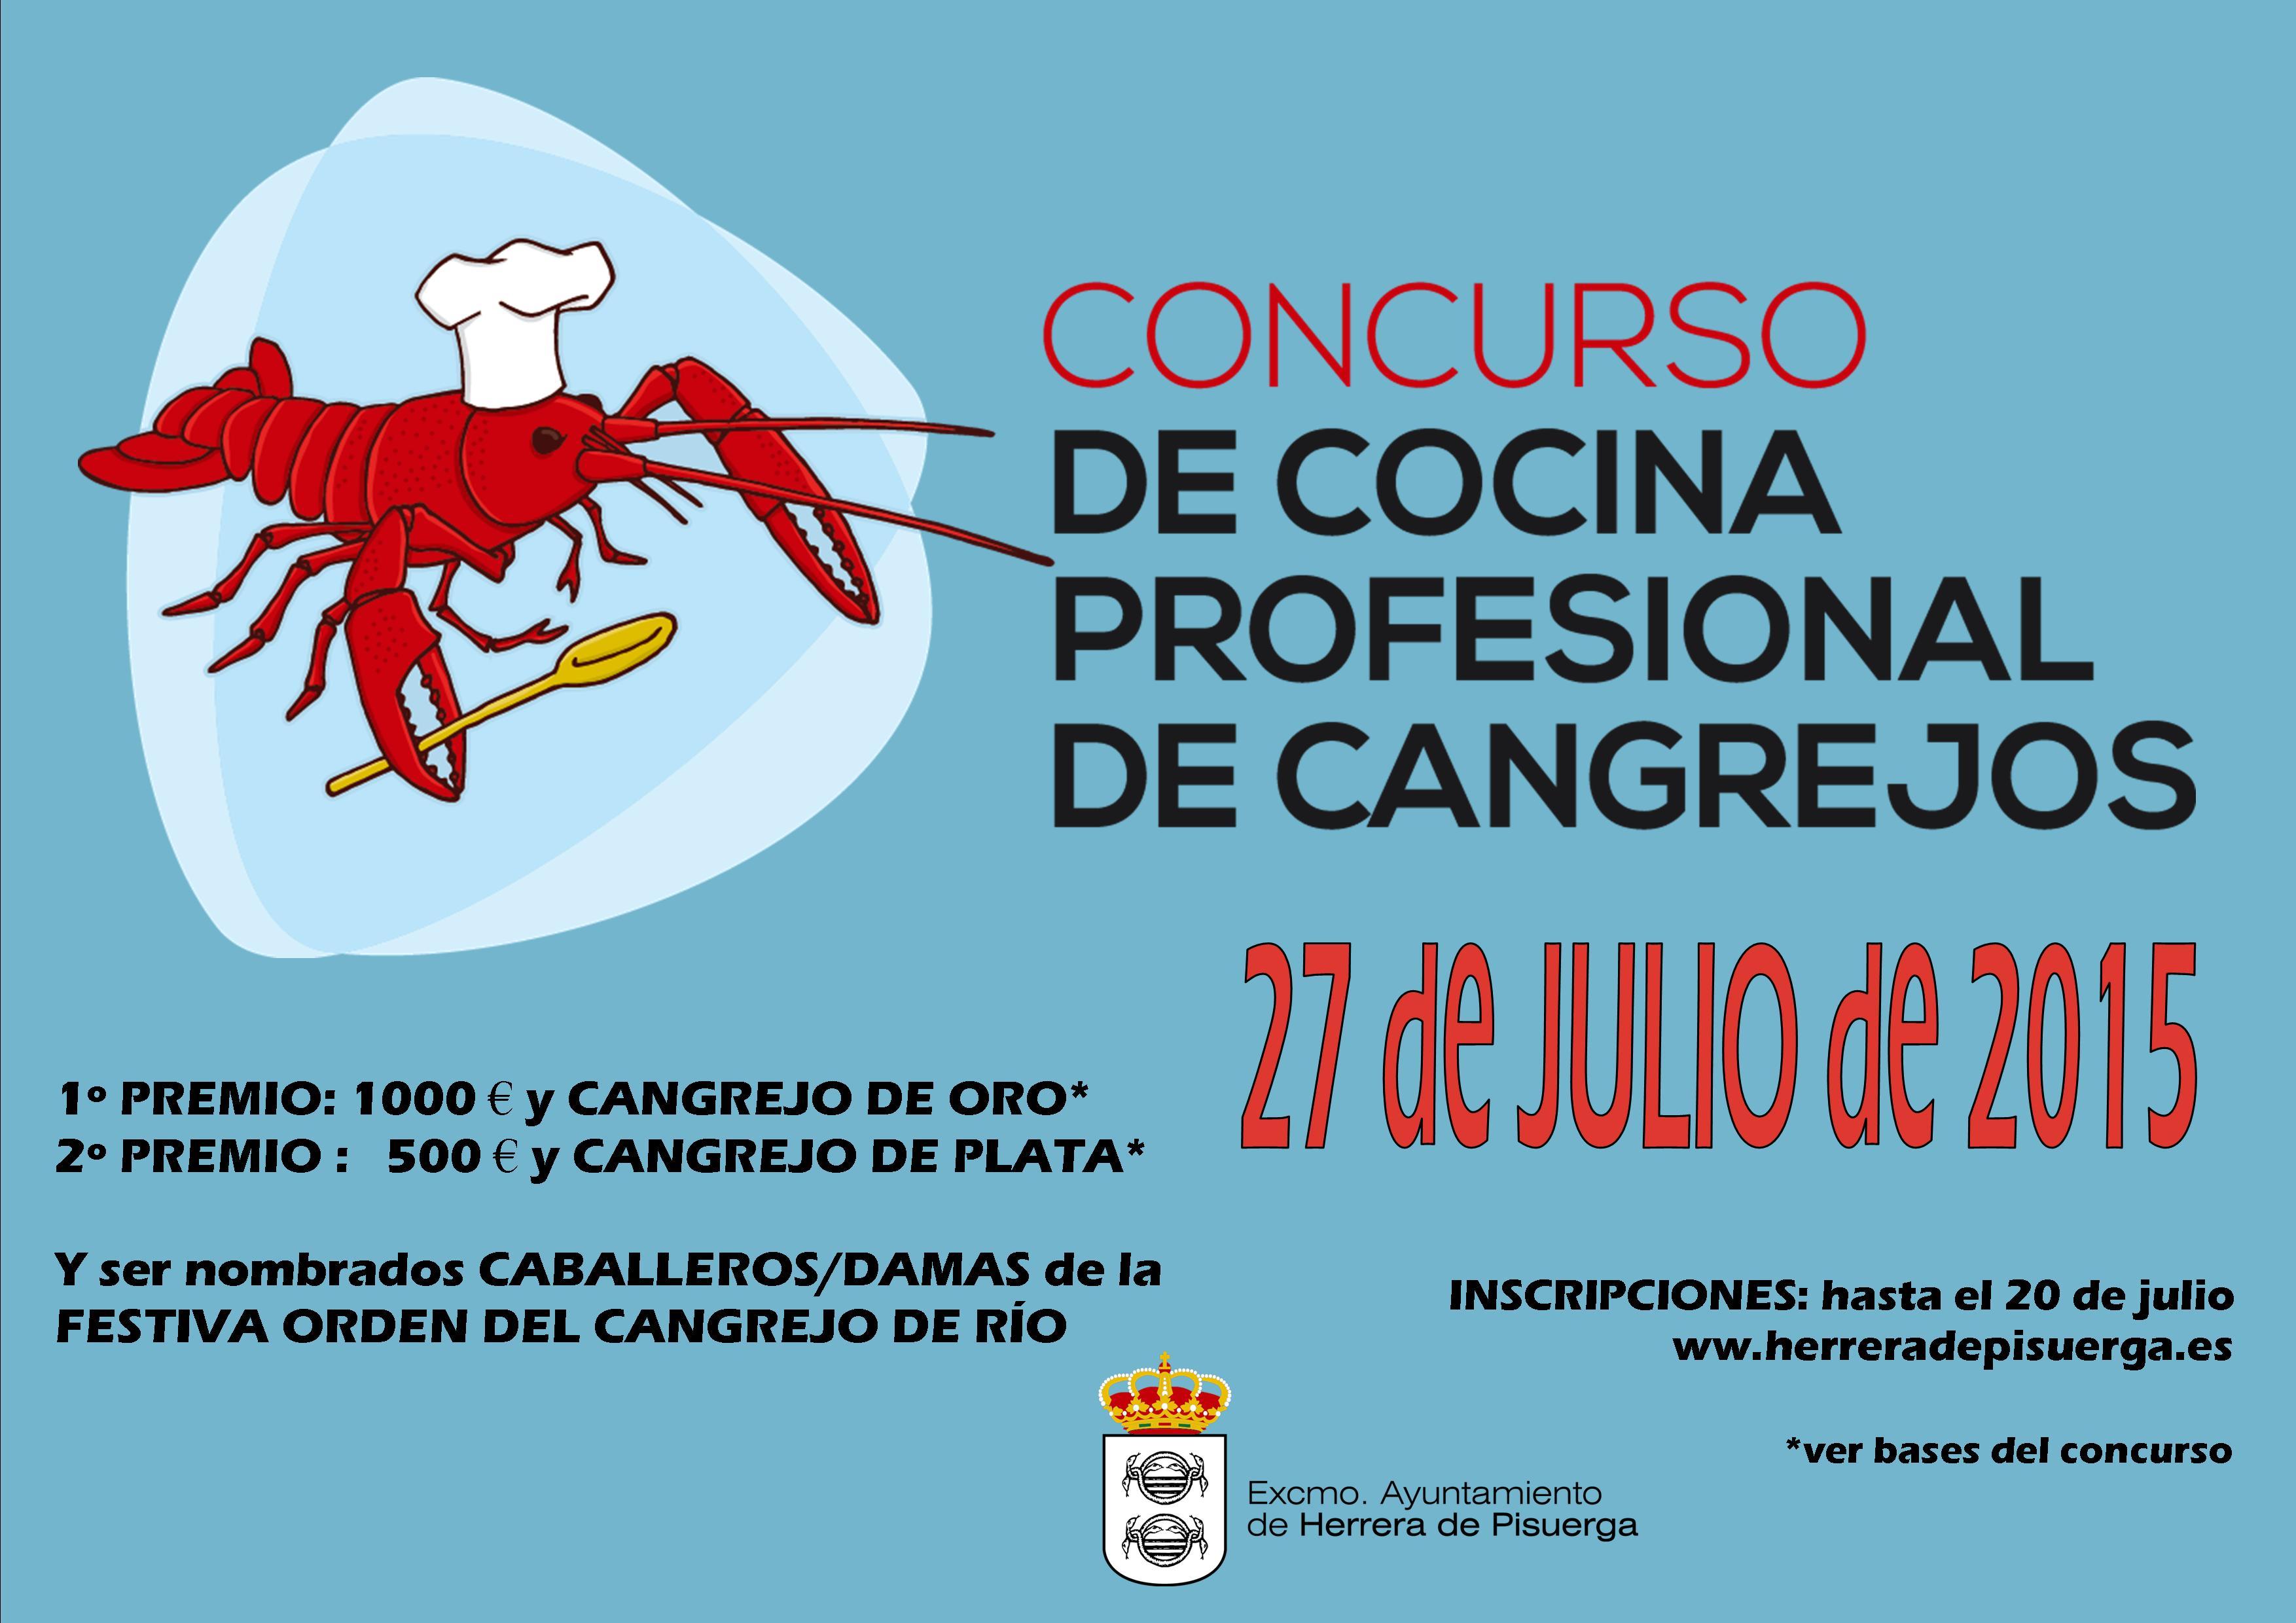 Concurso de cocina de cangrejos herrera de pisuerga - Concurso de cocina ...